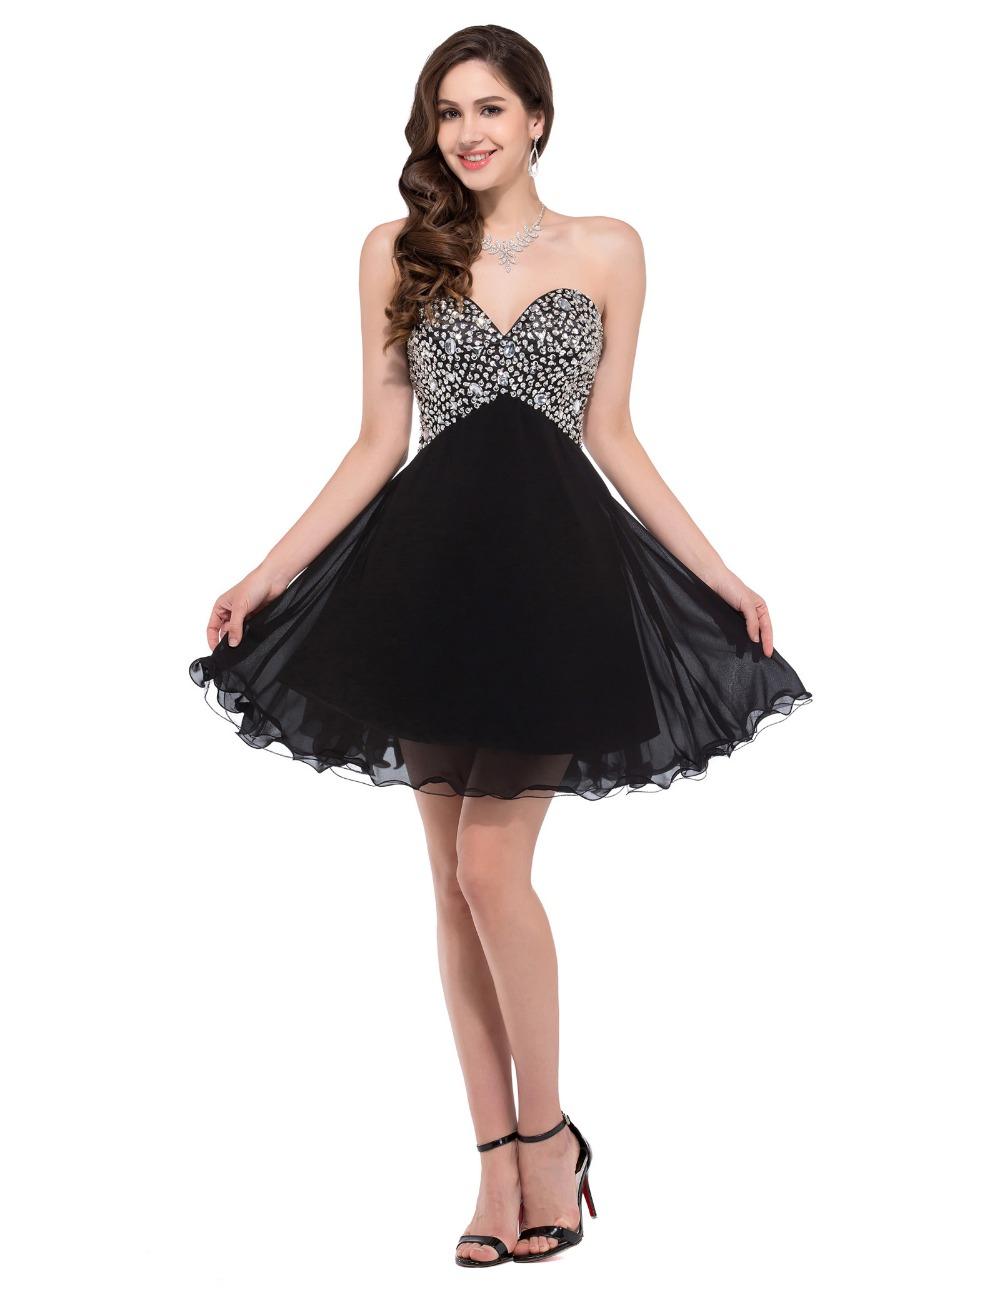 formal dress photo black and white strapless formal dresses